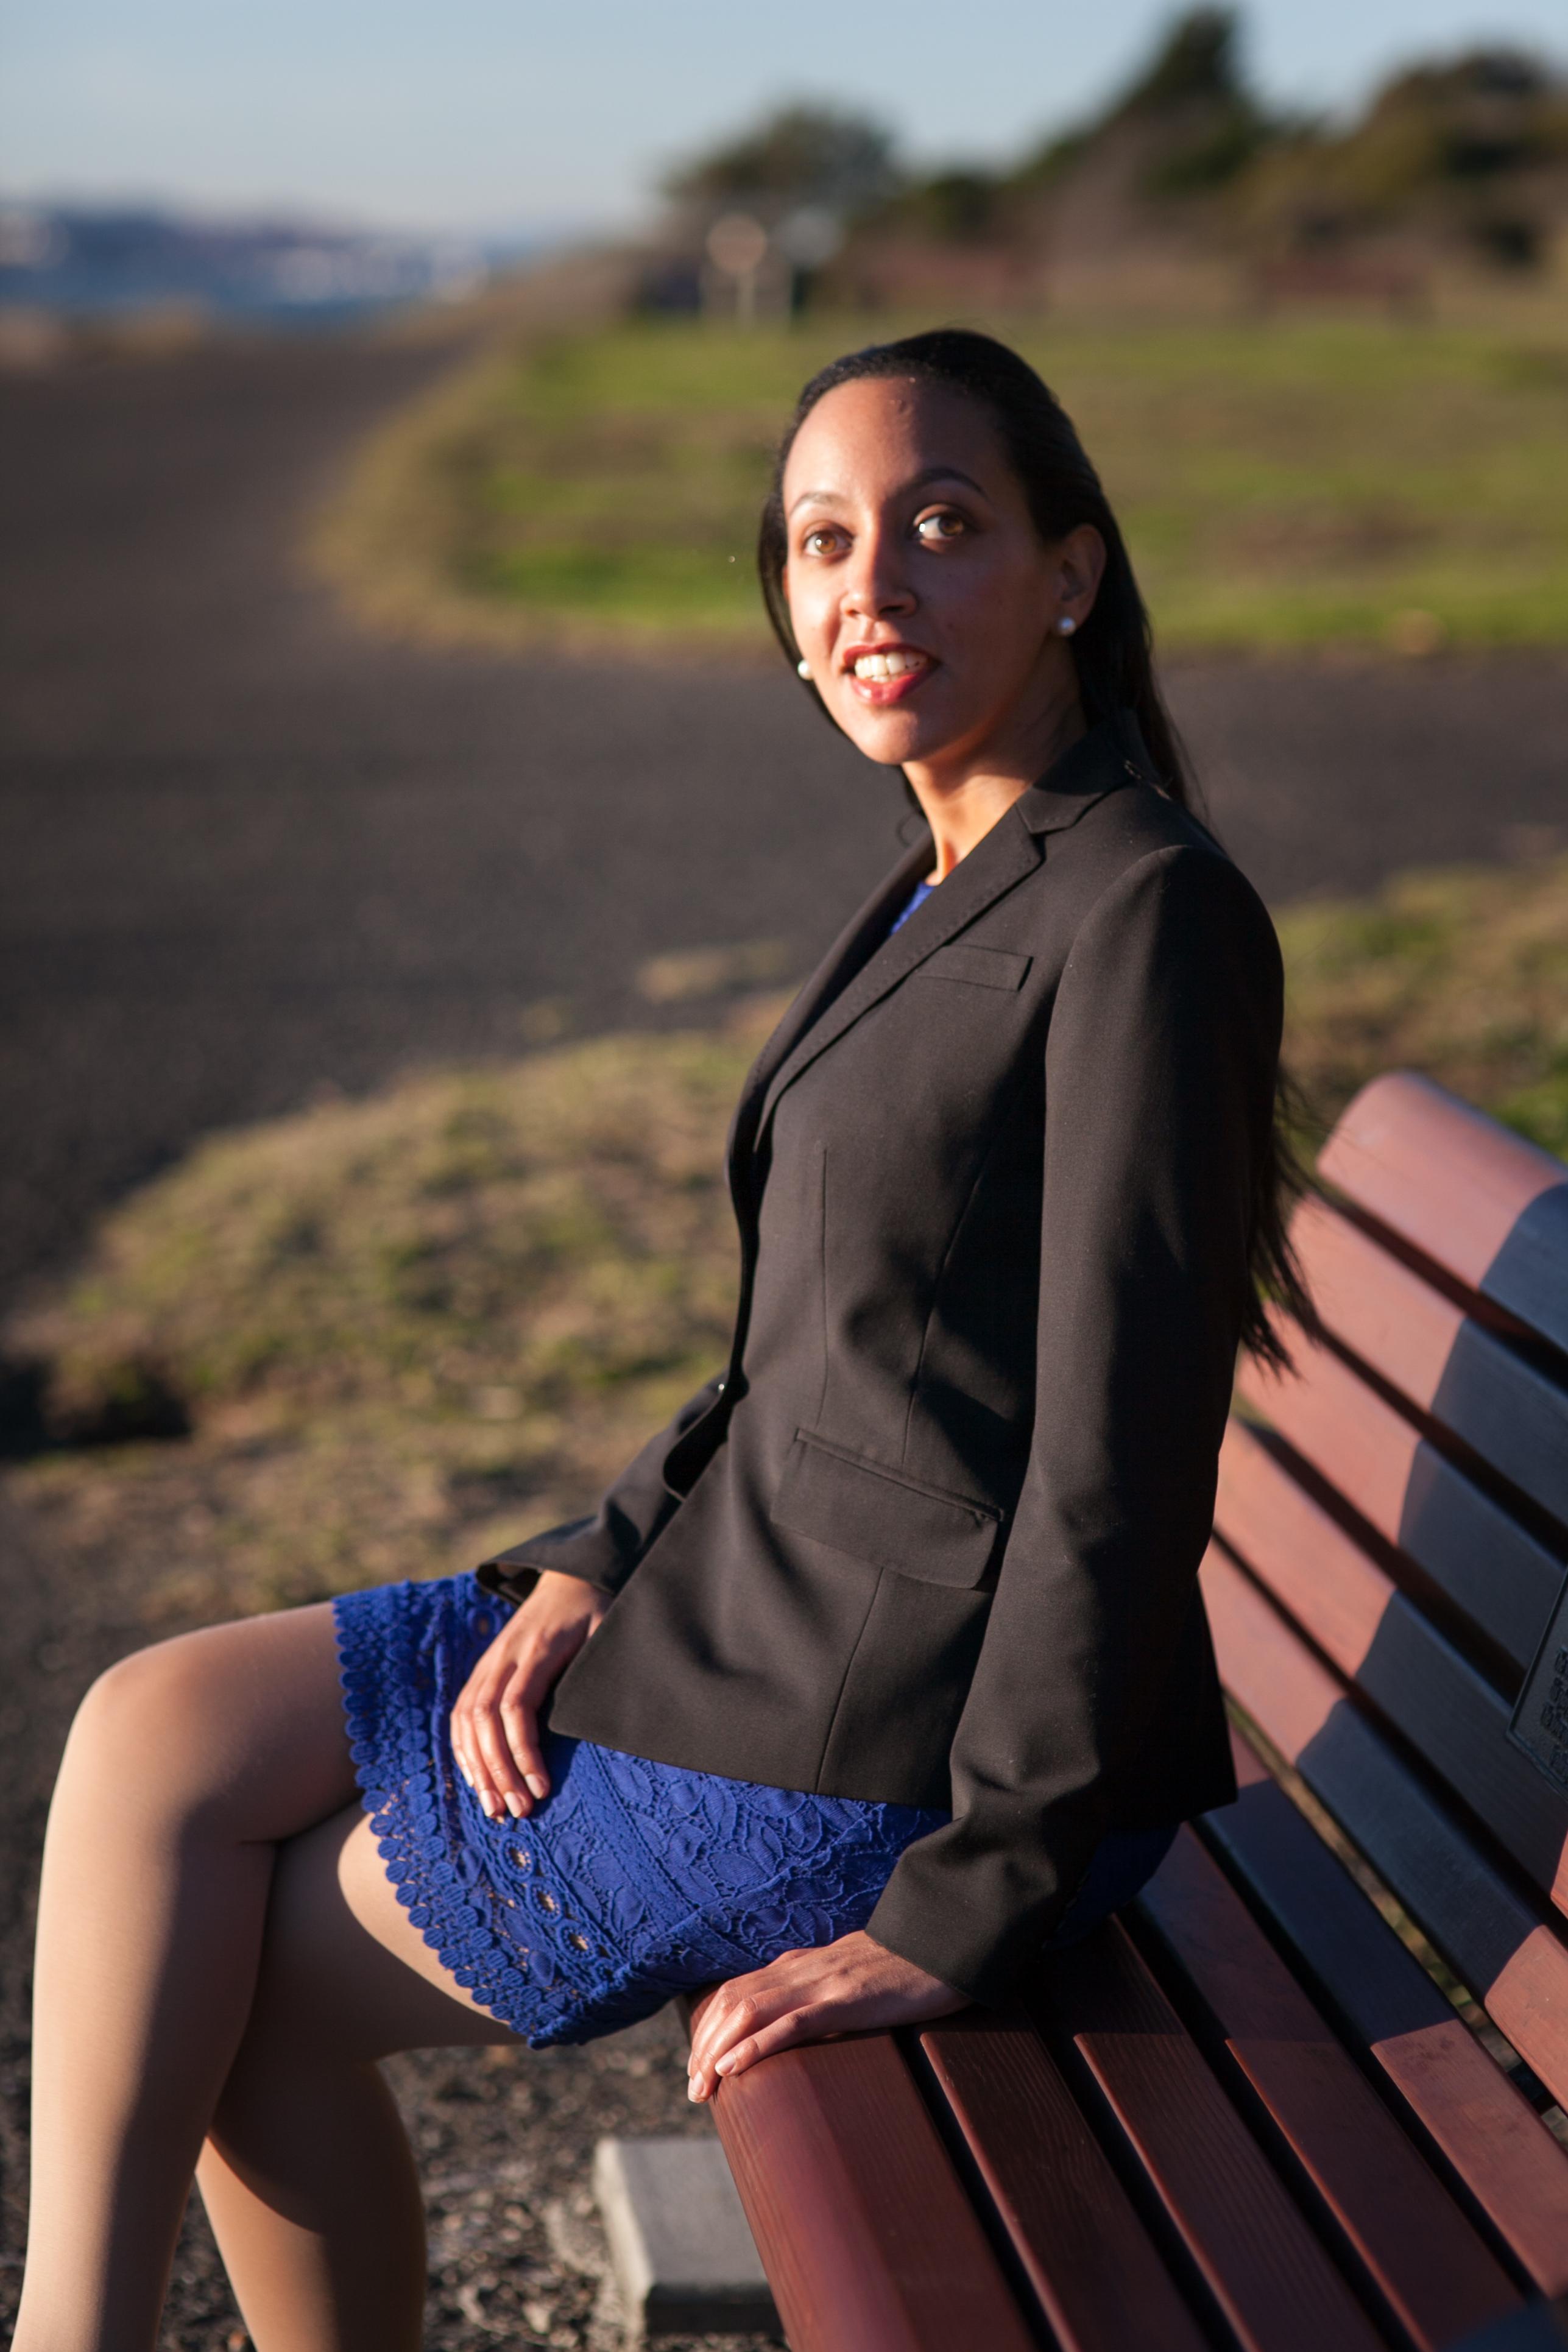 Haben sitting on a park bench at Berkeley Marina